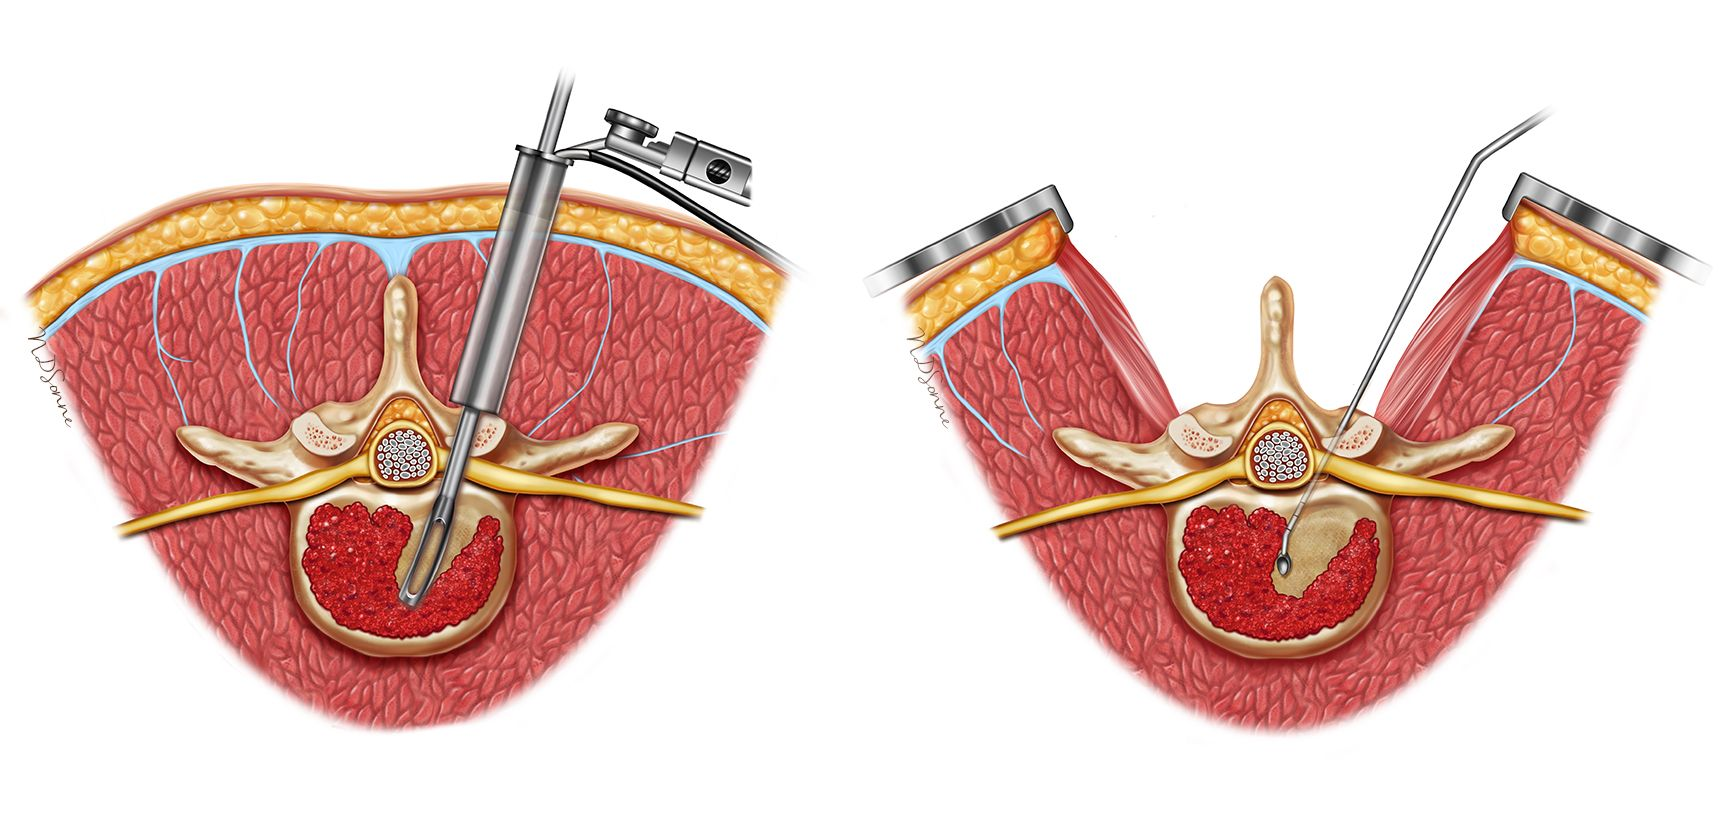 Introducing our new medical Illustrator – Olga Kurkina